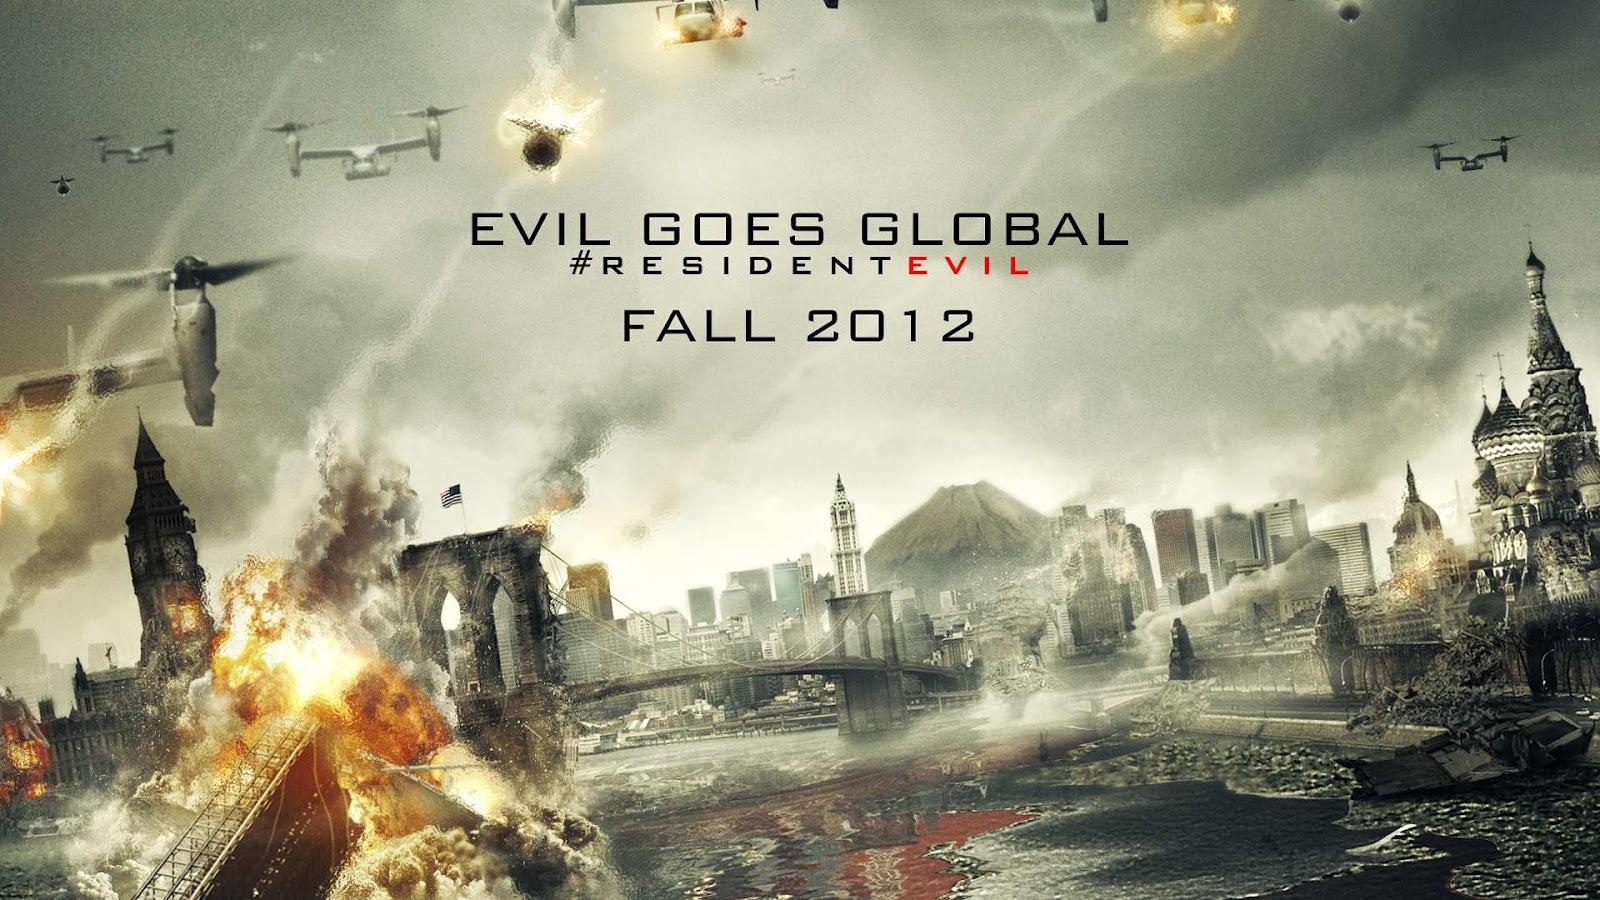 http://1.bp.blogspot.com/-M6lilH5O5DM/T-hry0cLnMI/AAAAAAAAA6c/sP1T8wo7HtI/s1600/resident-evil-retribution-2012-wallpaper.jpg